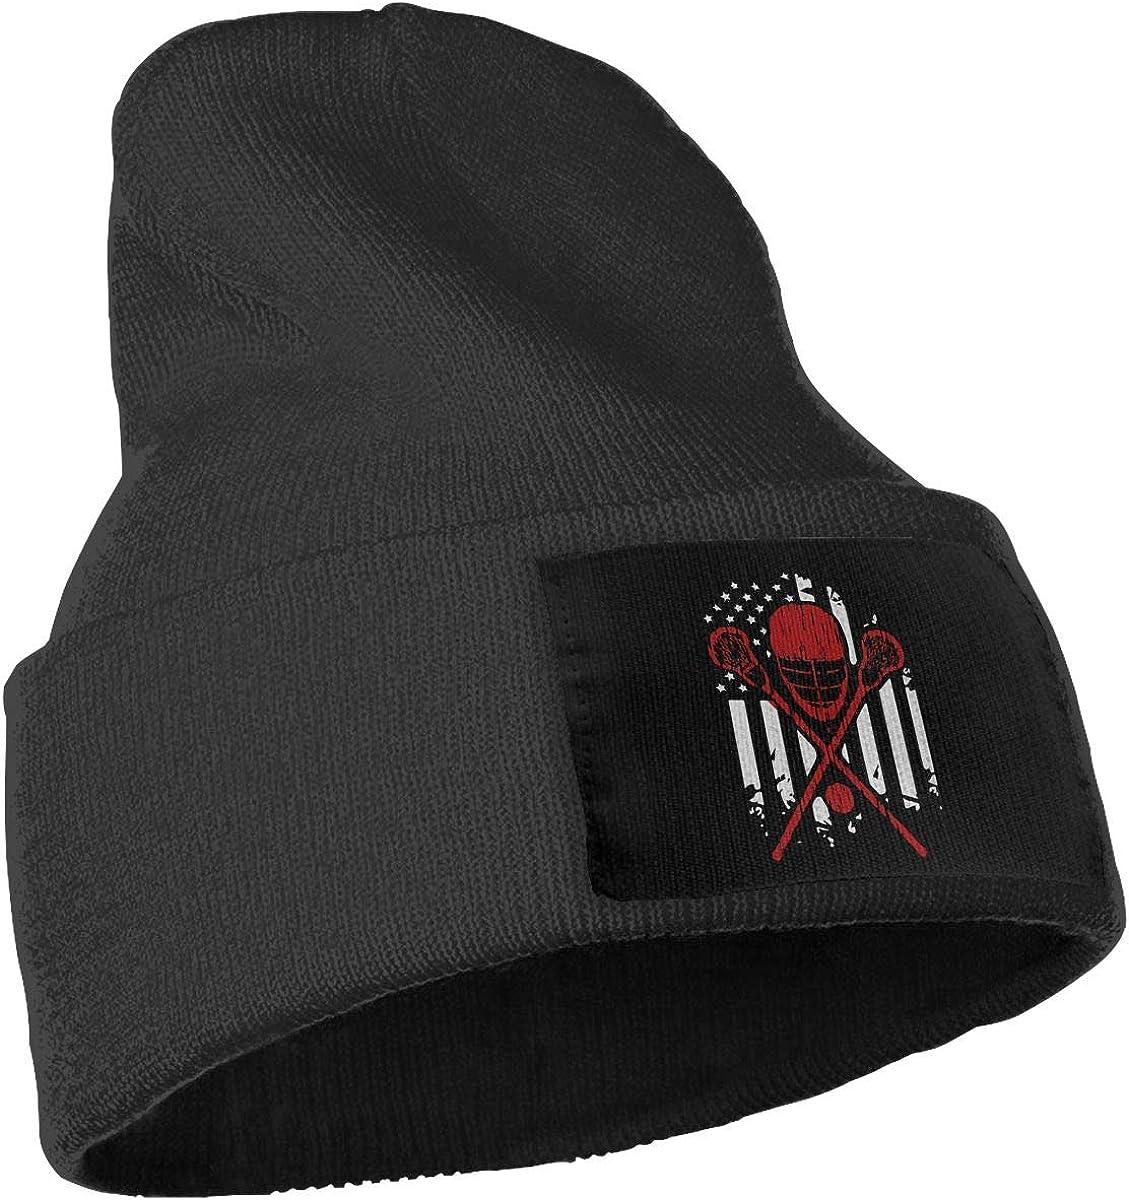 Men /& Women Lacrosse American Flag Outdoor Warm Knit Beanies Hat Soft Winter Skull Caps